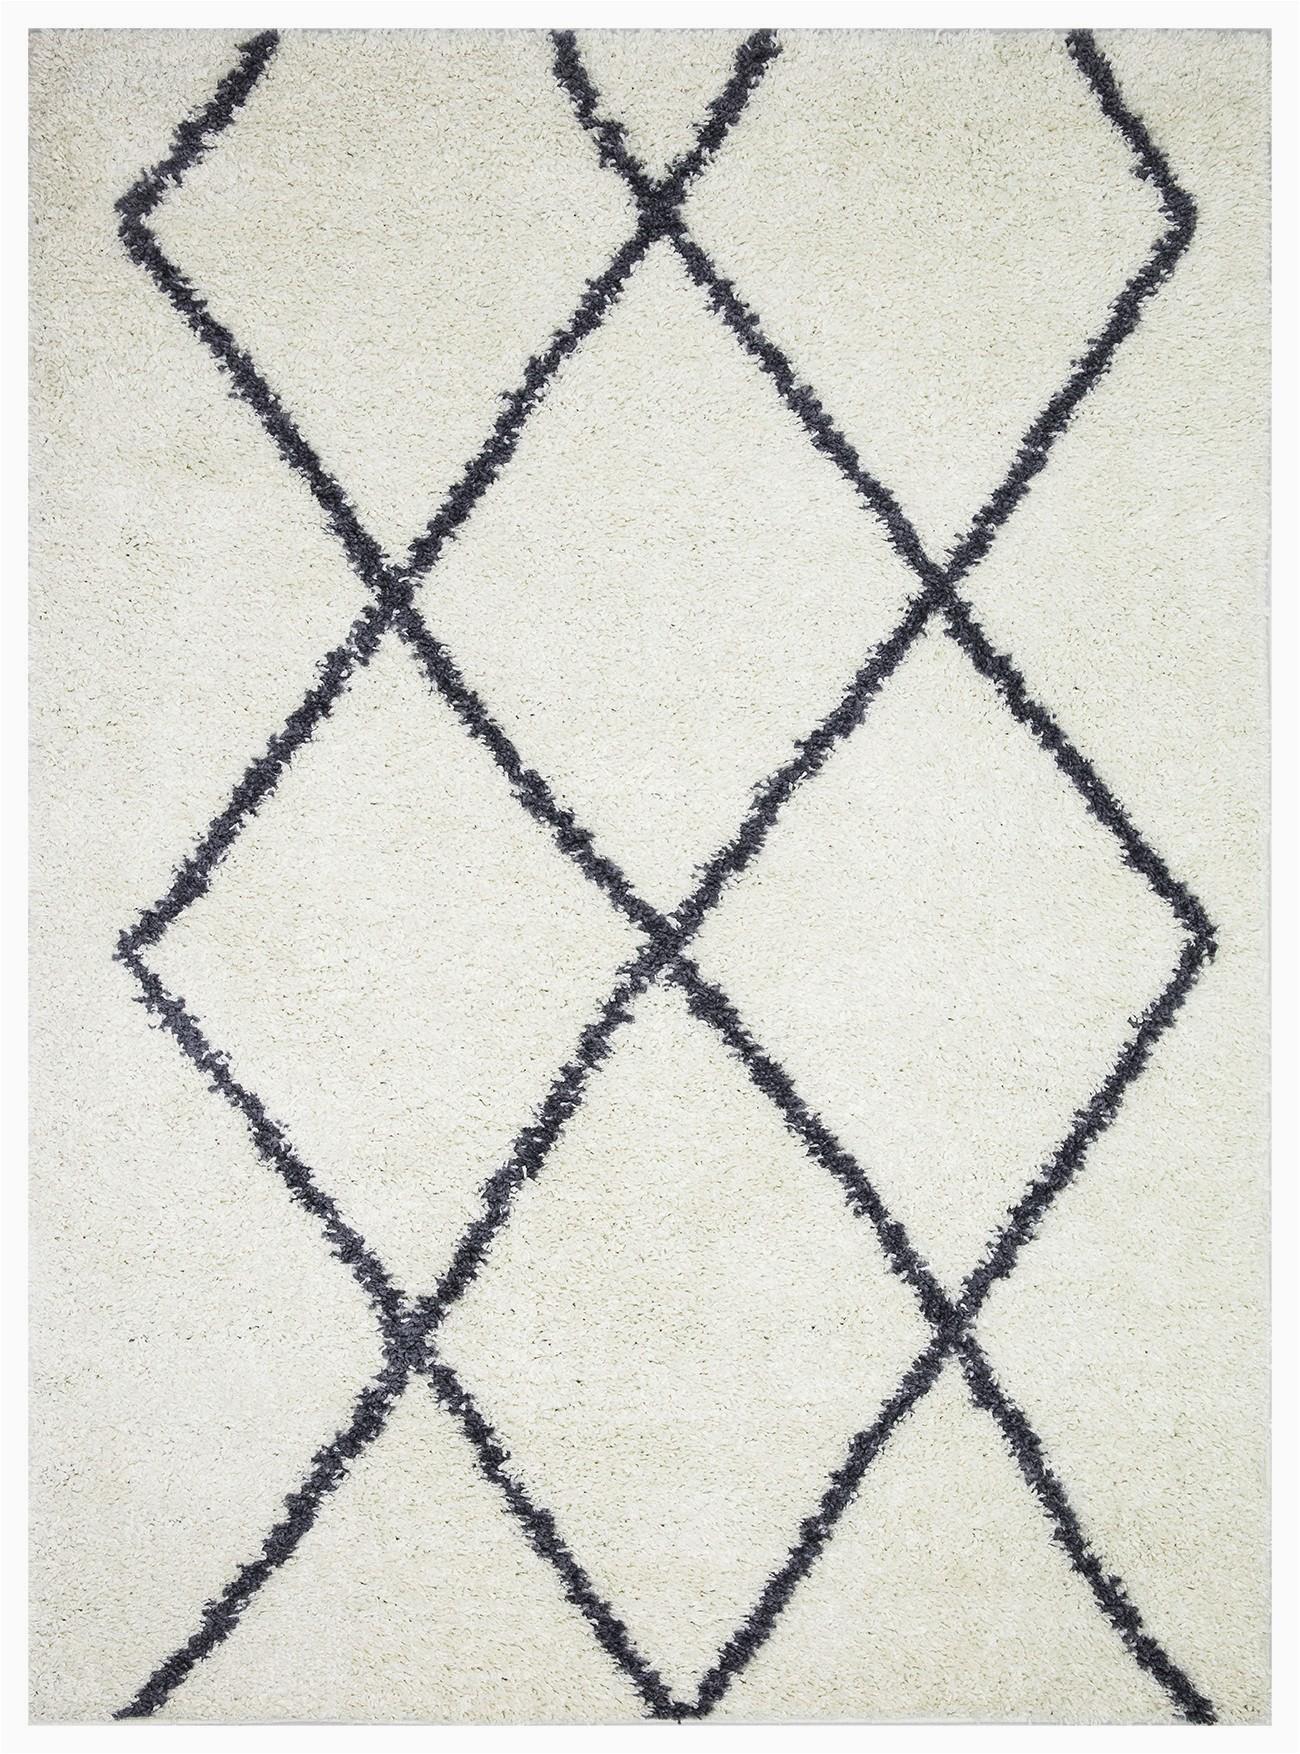 vienna collection modern geometric shaggy area rug g2927 white dark grey